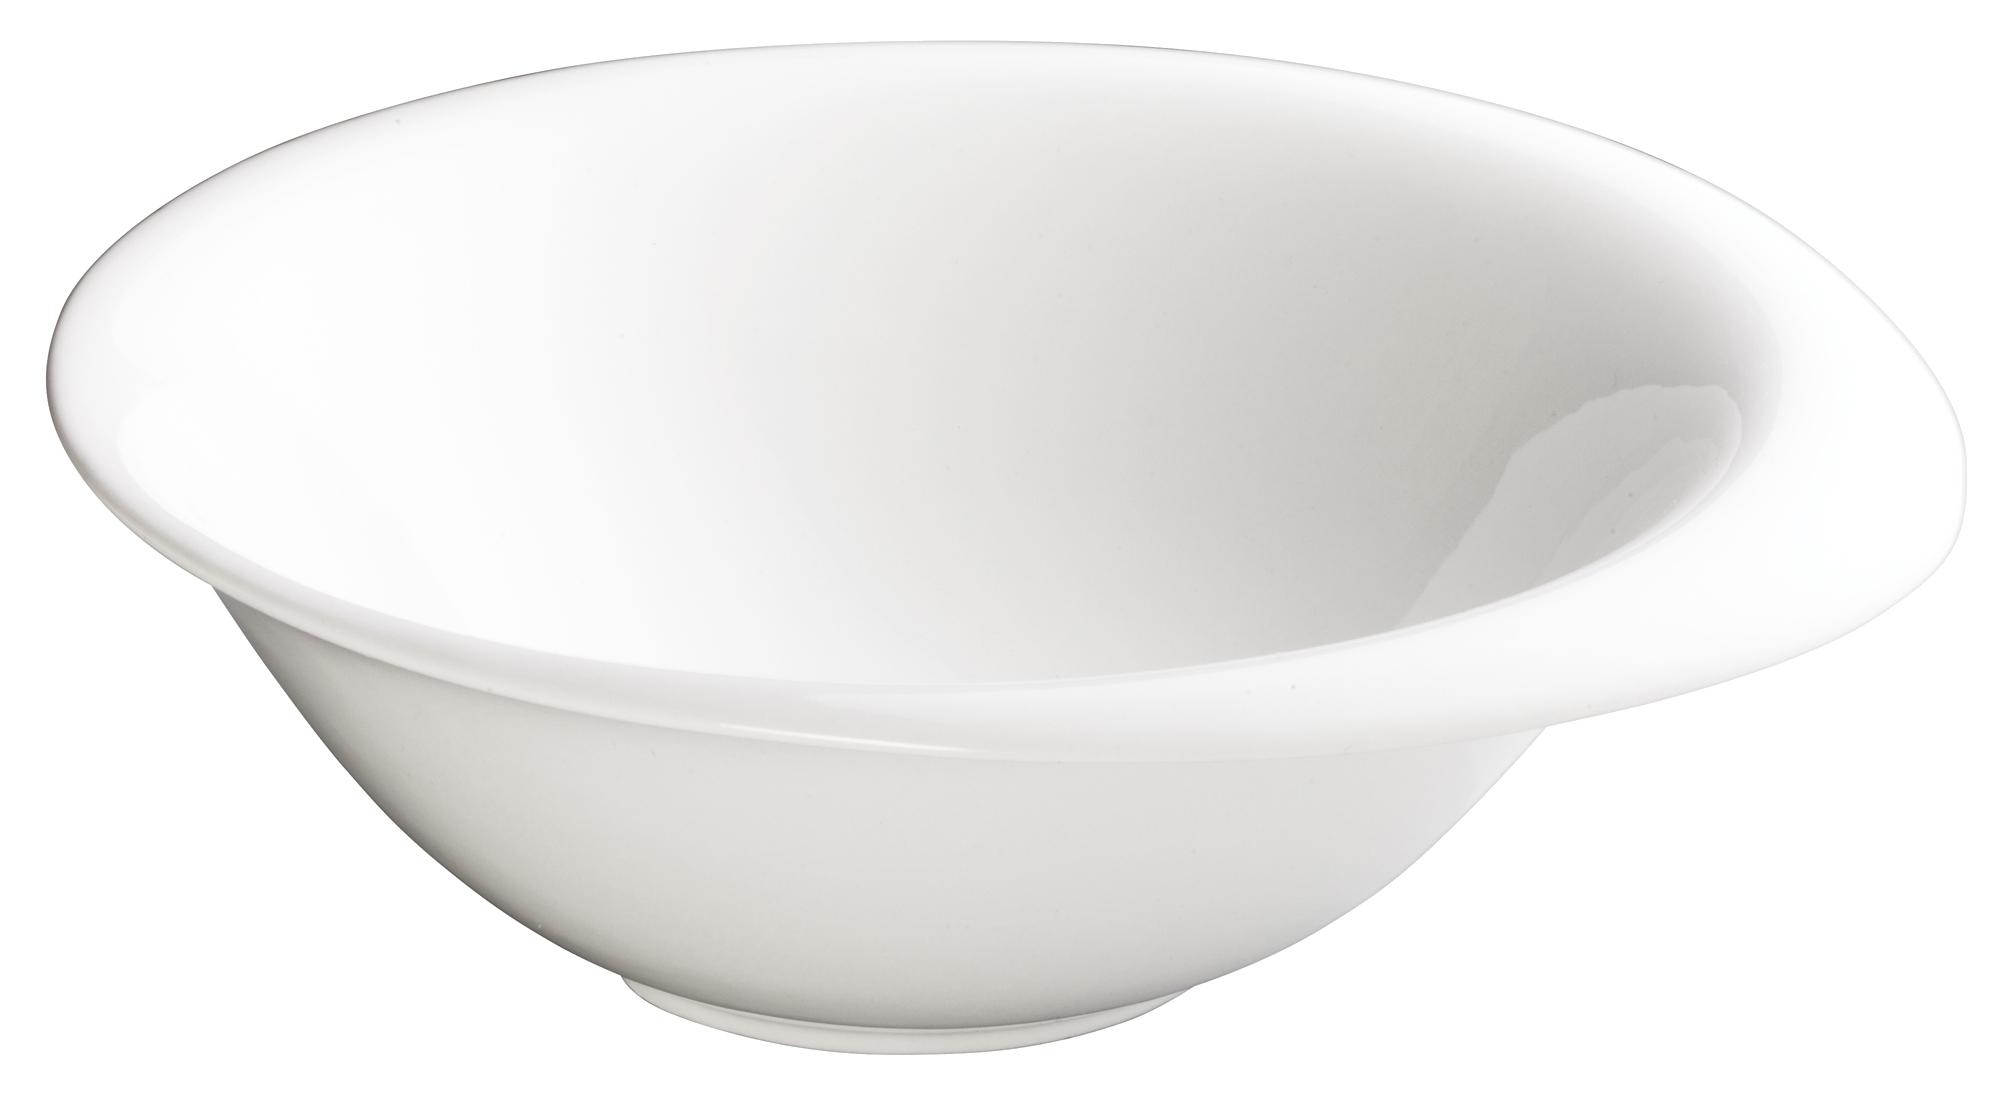 Winco WDP004-208 china, bowl, 33 - 64 oz